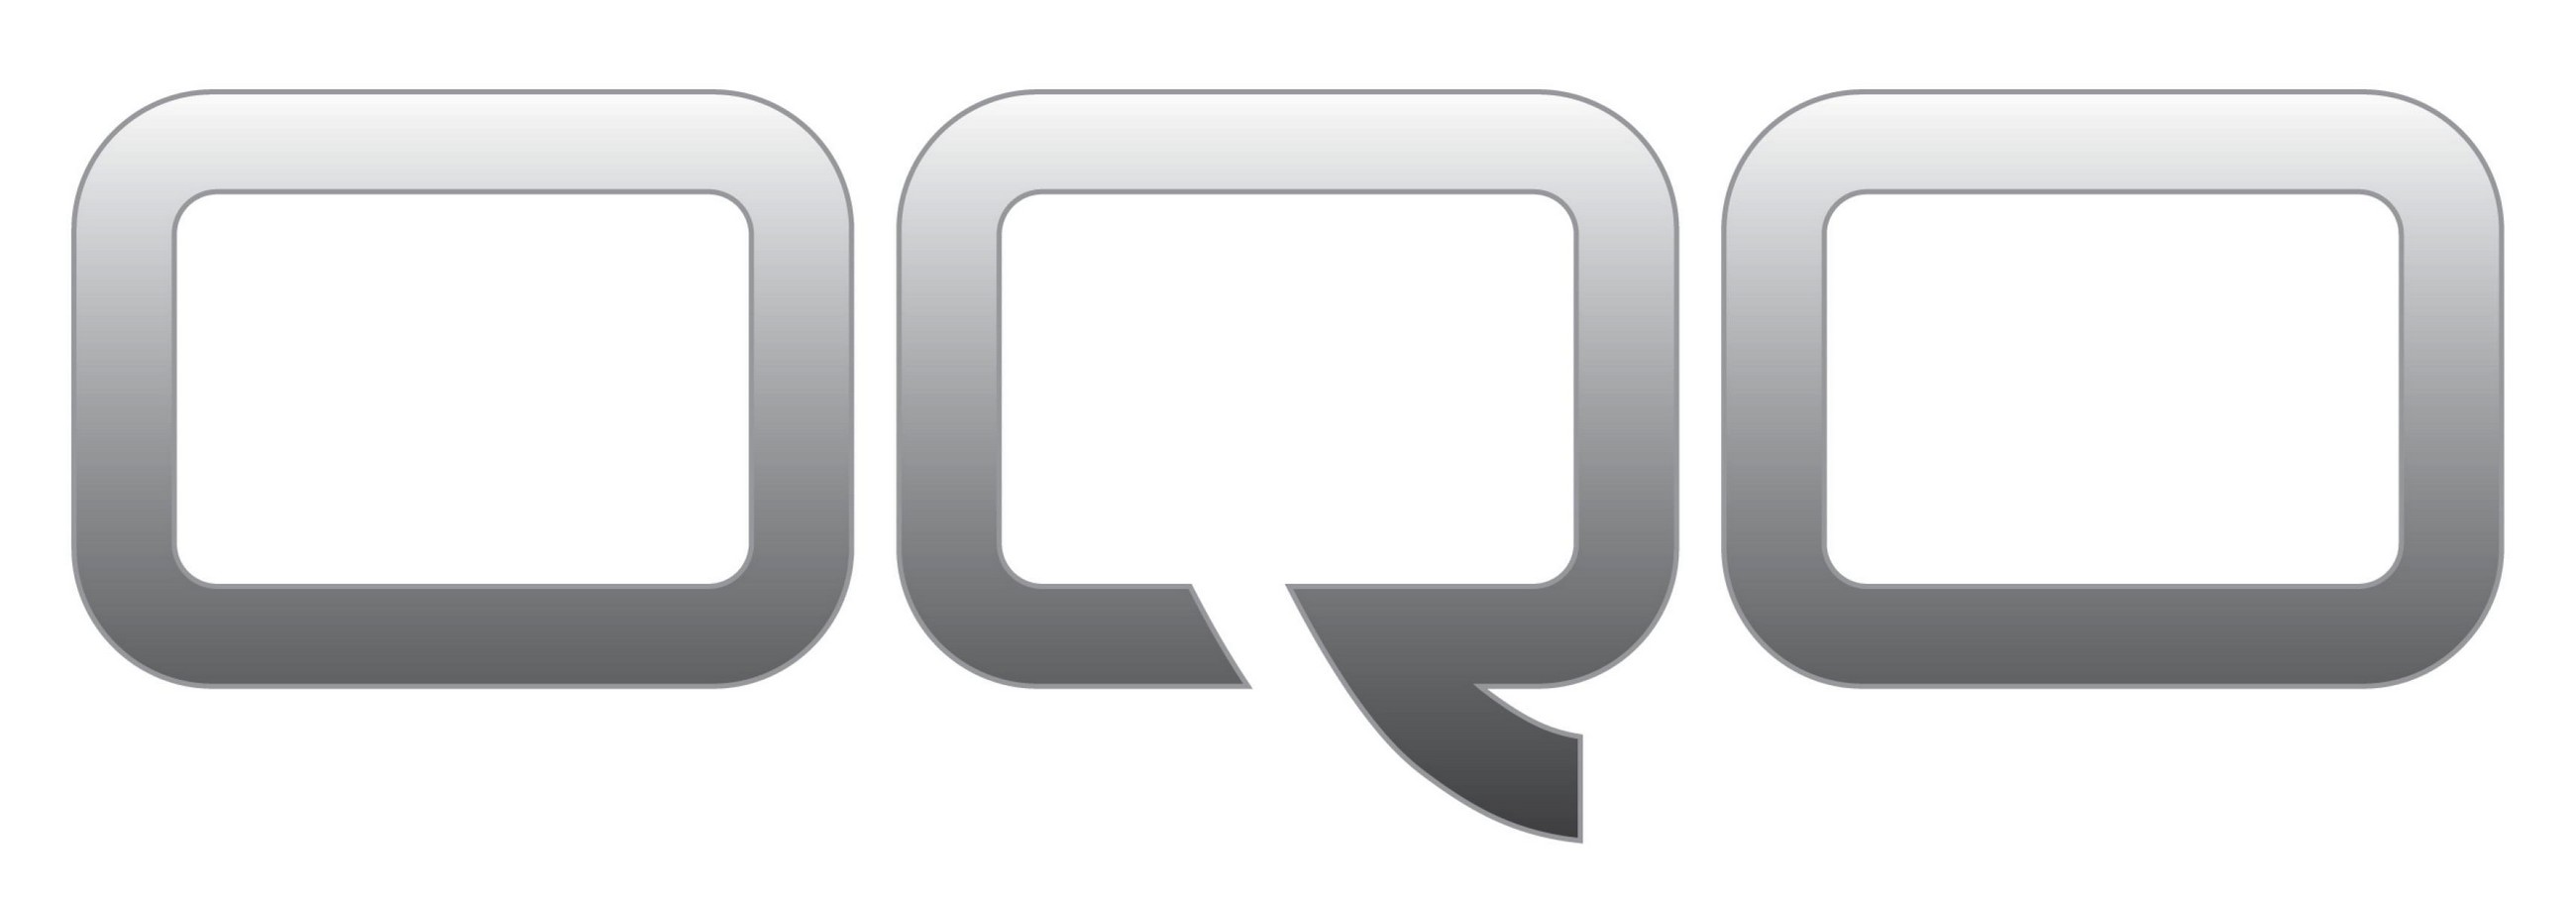 oqo logo vector